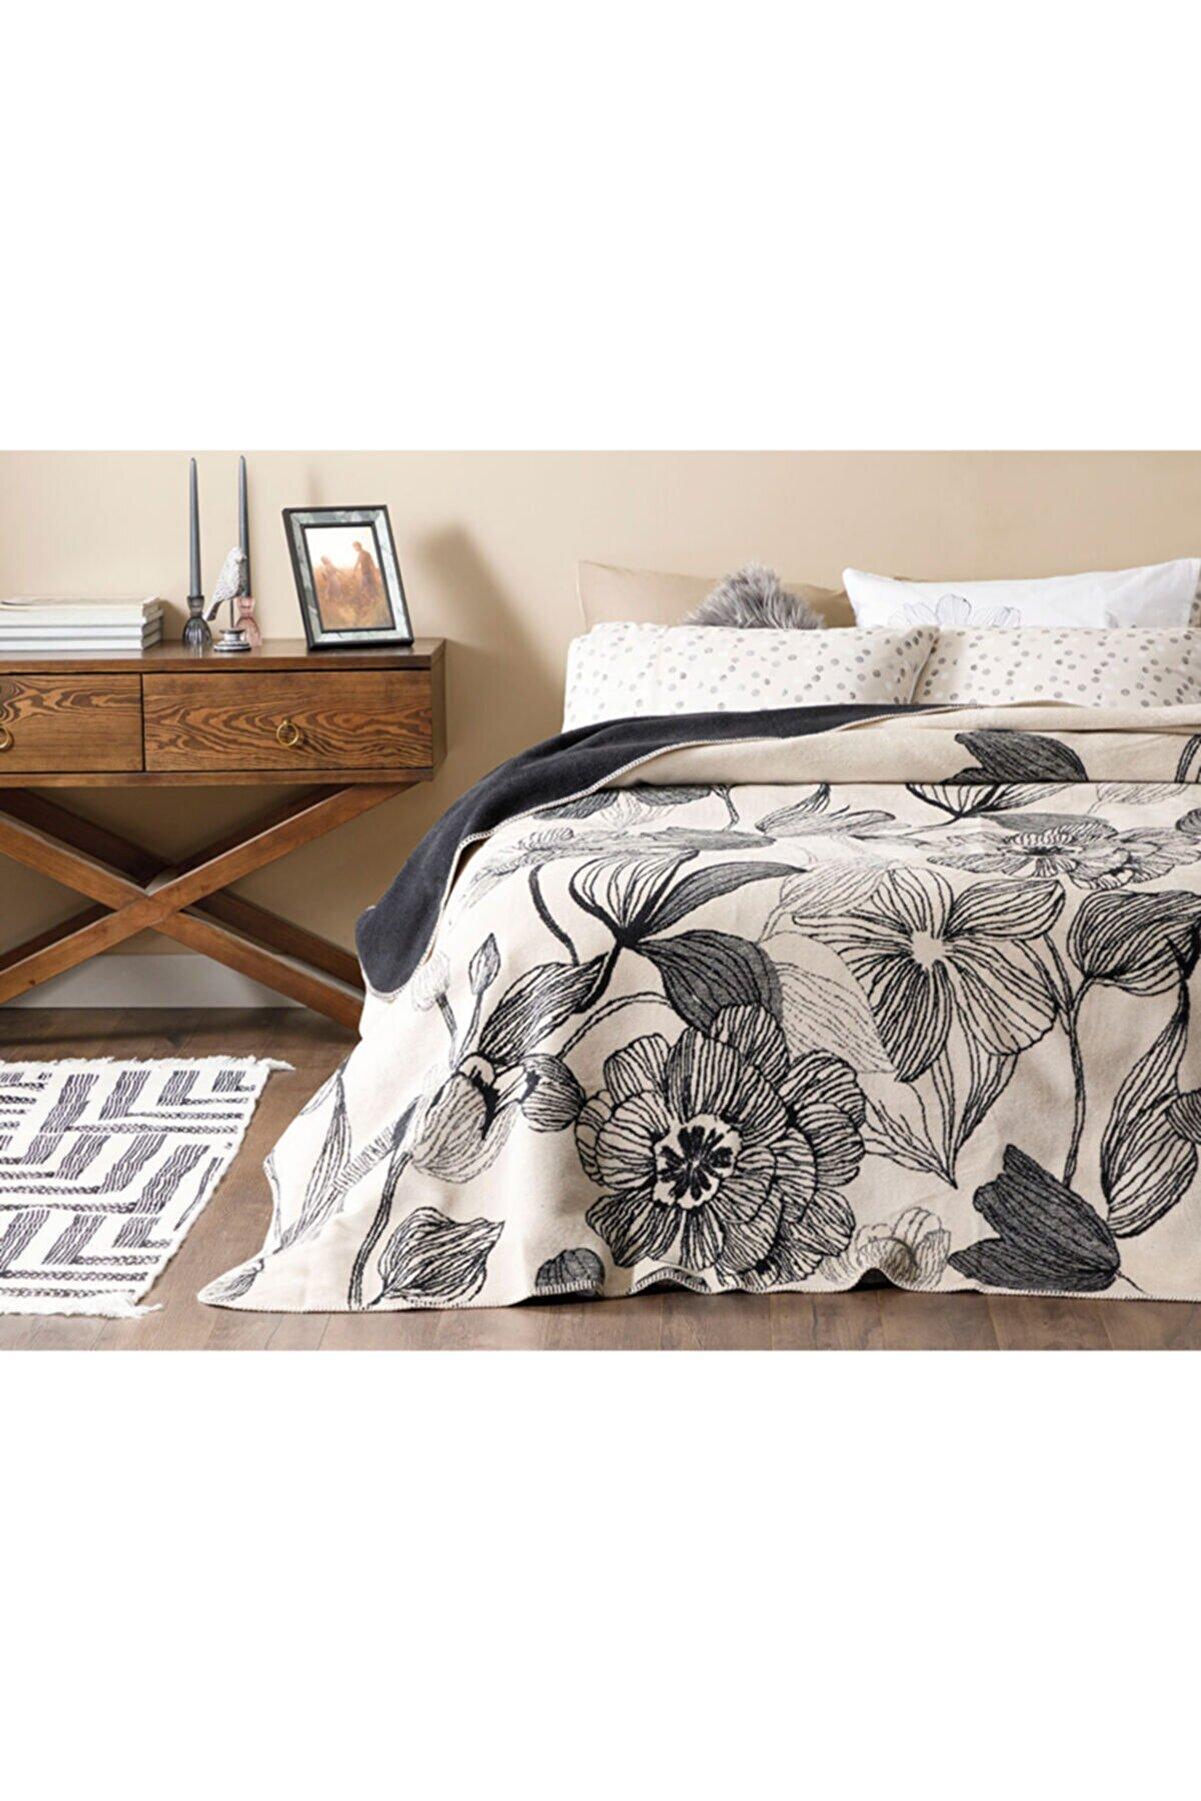 English Home Dark Mono Pamuklu Çift Kişilik Battaniye 200x220 Cm Bej - Siyah